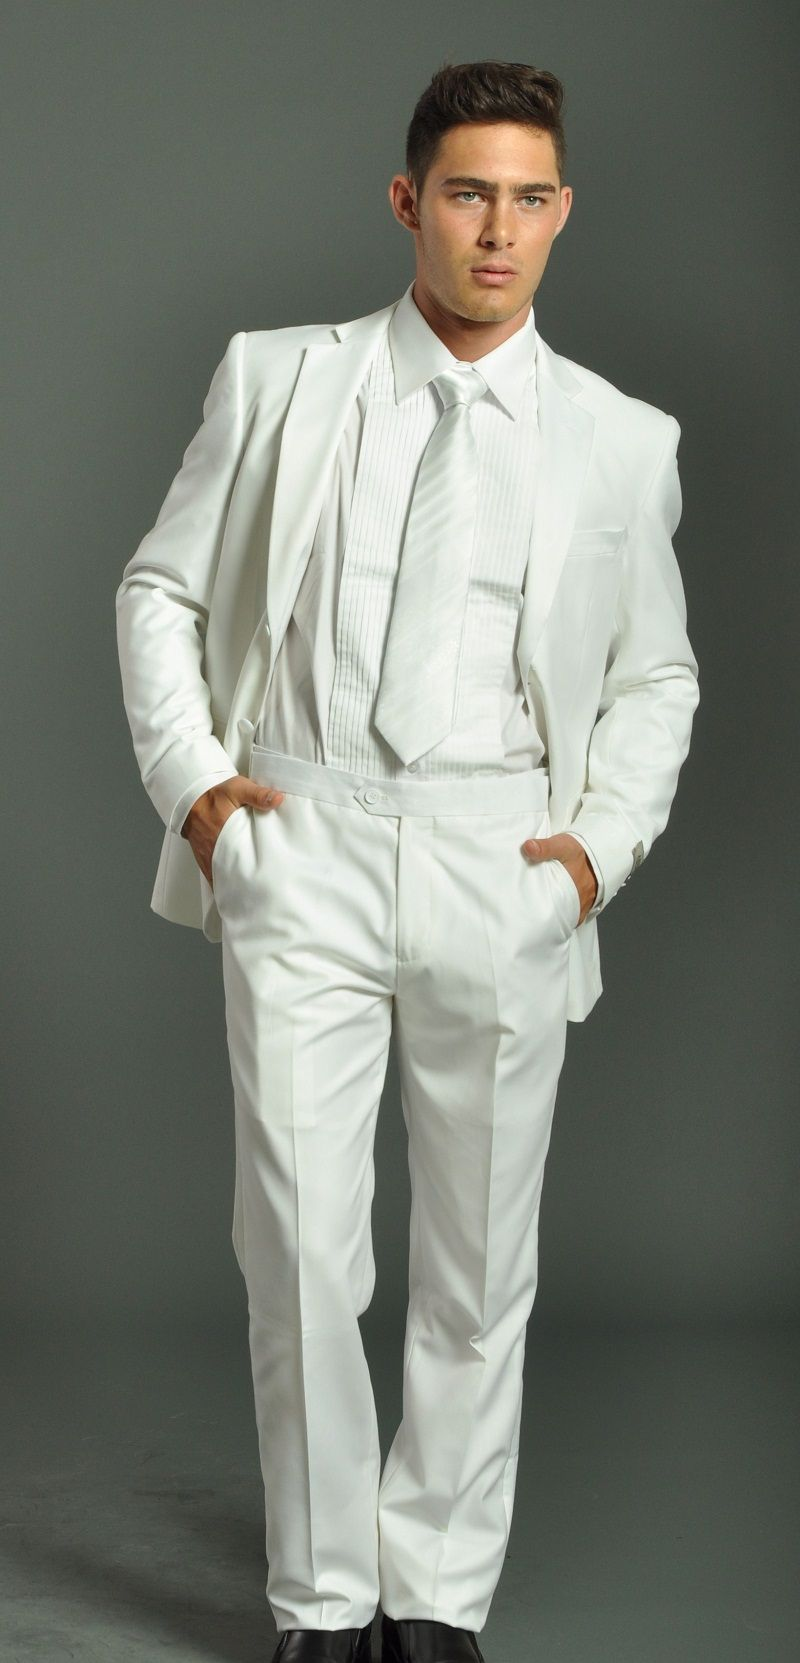 All White Tuxedos | Men\'s Two Button Solid White Tuxedo Suit | PROM ...